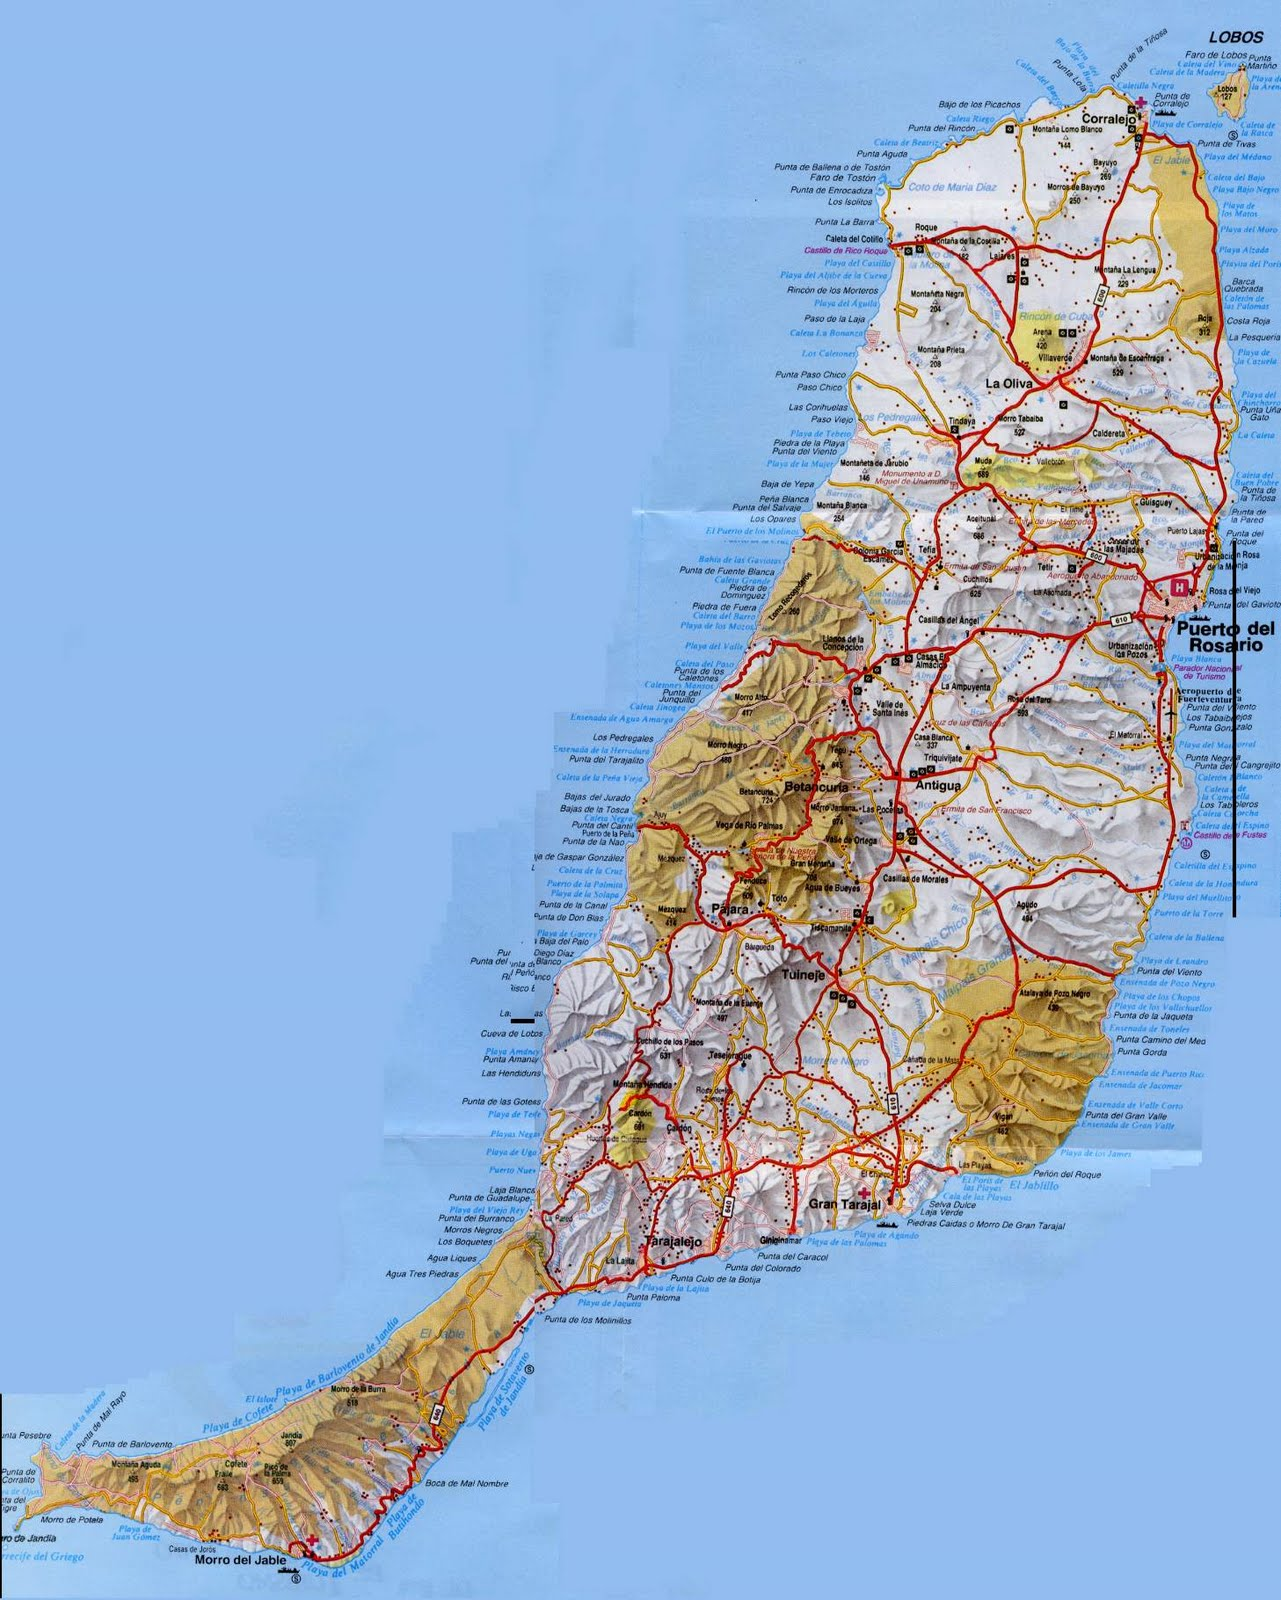 Cartograf Fr L Espagne Les Iles Canaries Fuerteventura